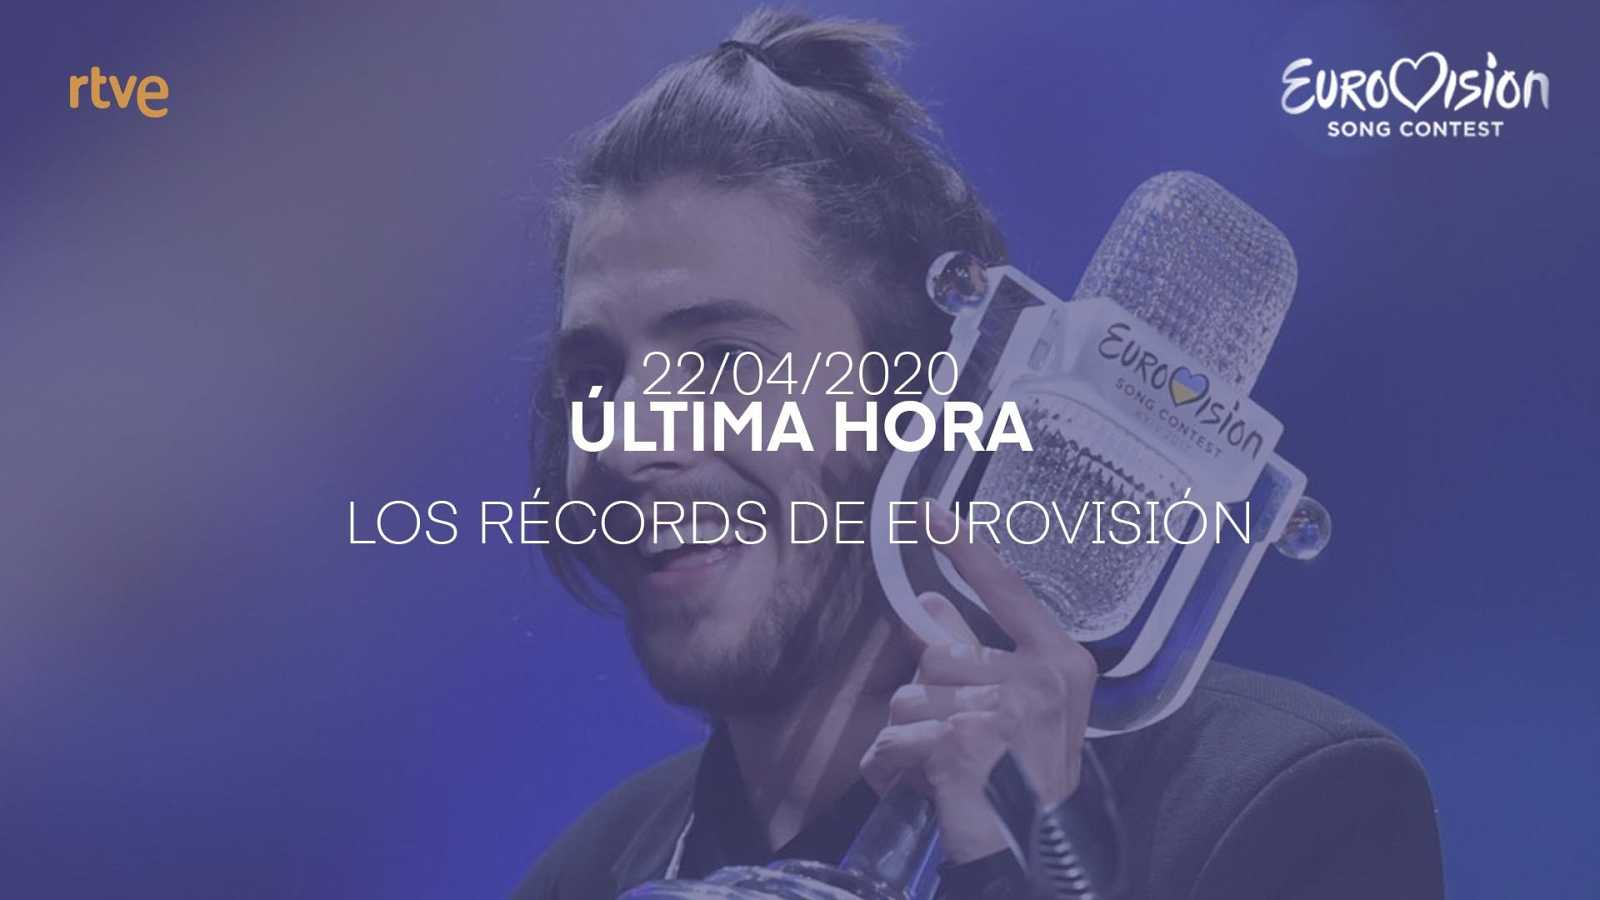 Los récords de Eurovisión